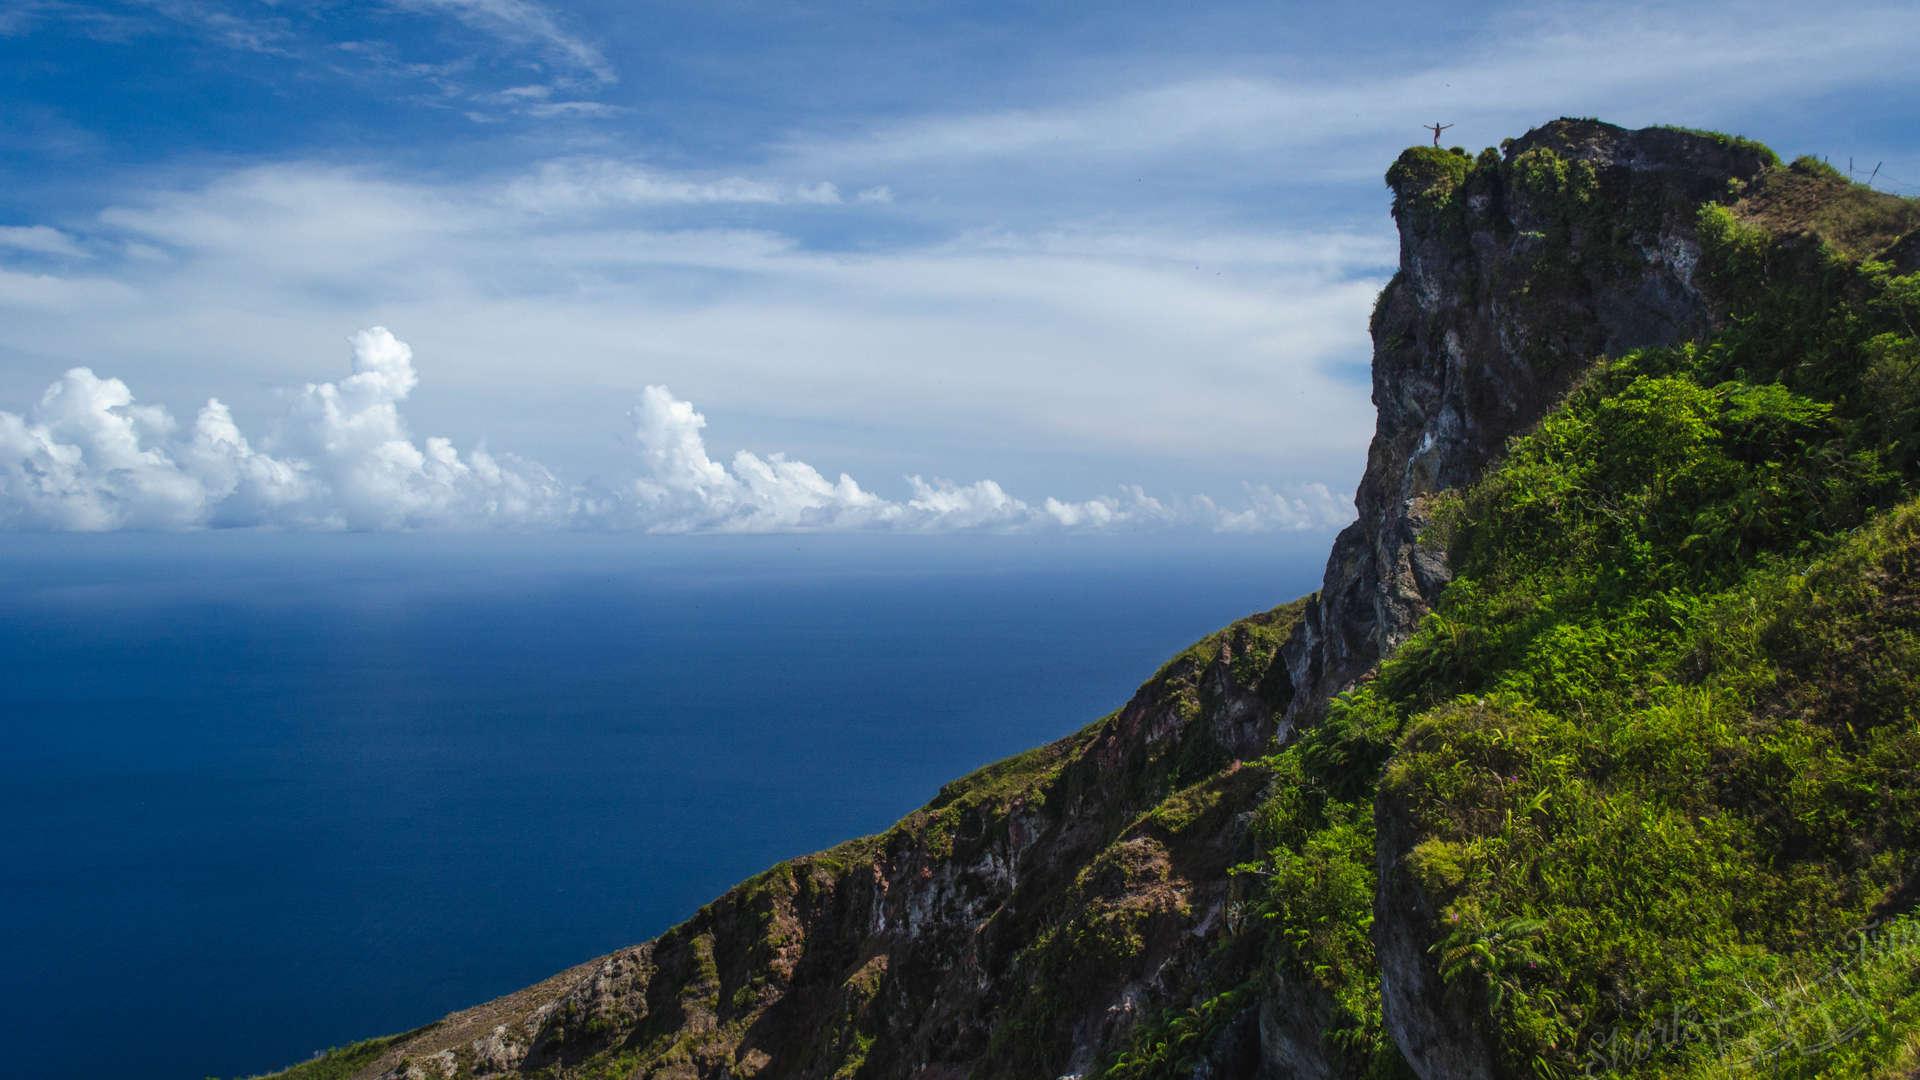 pulau api, island api, banda islands, banda volcano, how to climb api